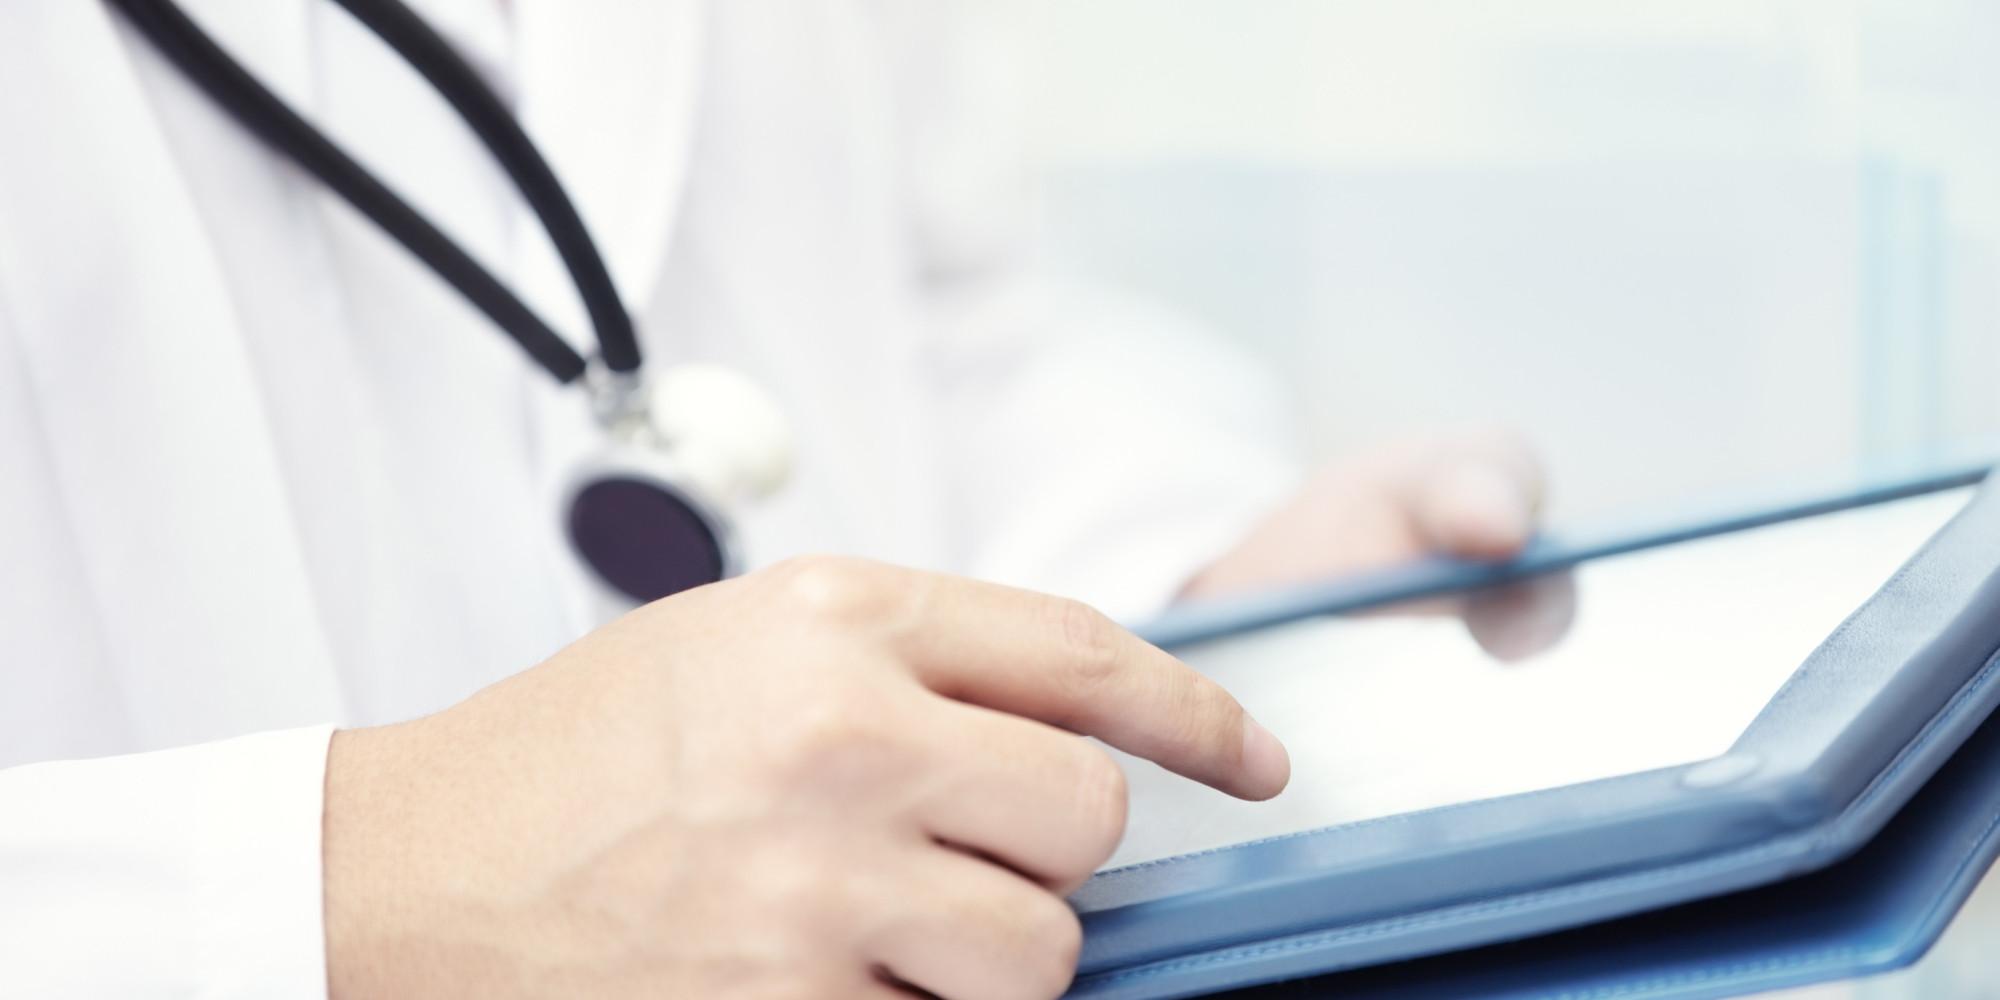 Advancements in Regenerative Medicine Have Made Artificial